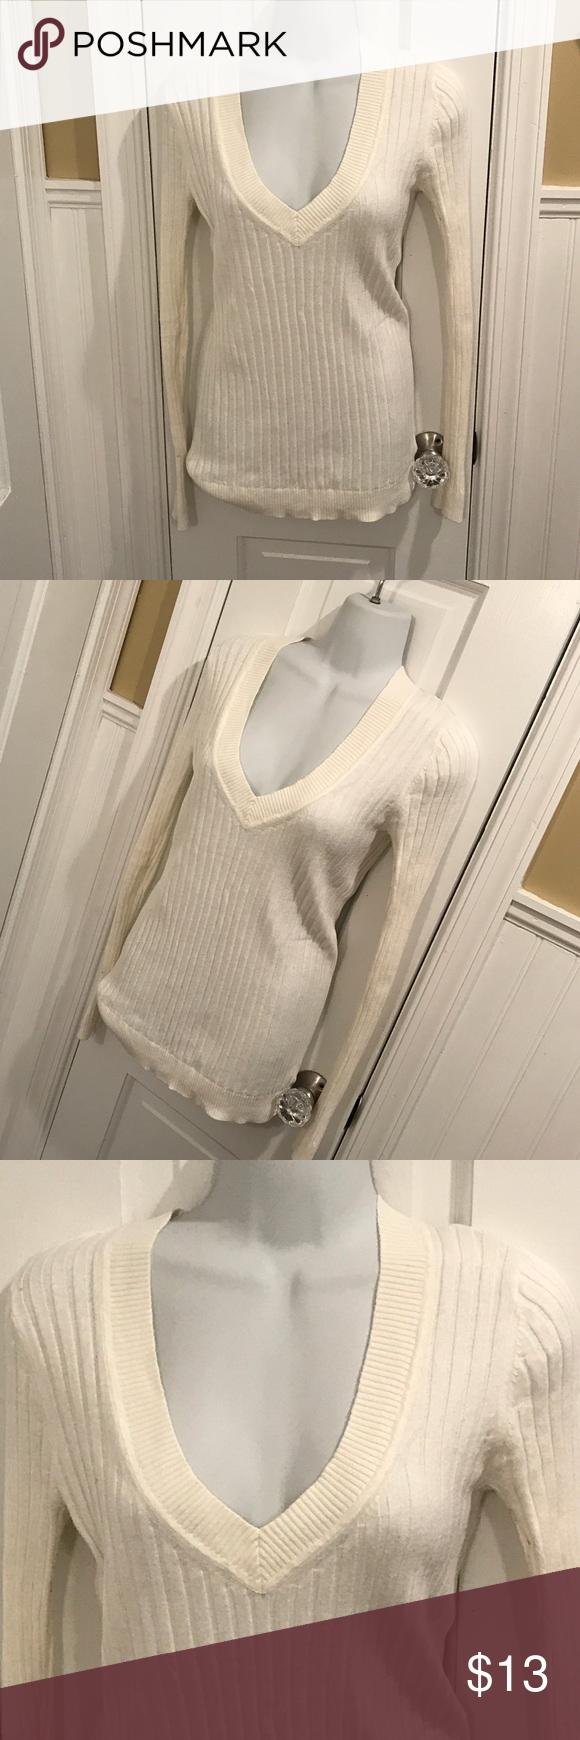 "Express vneck sweater Light cream vneck ribbed sweater. About 26"" long. Express Sweaters V-Necks"